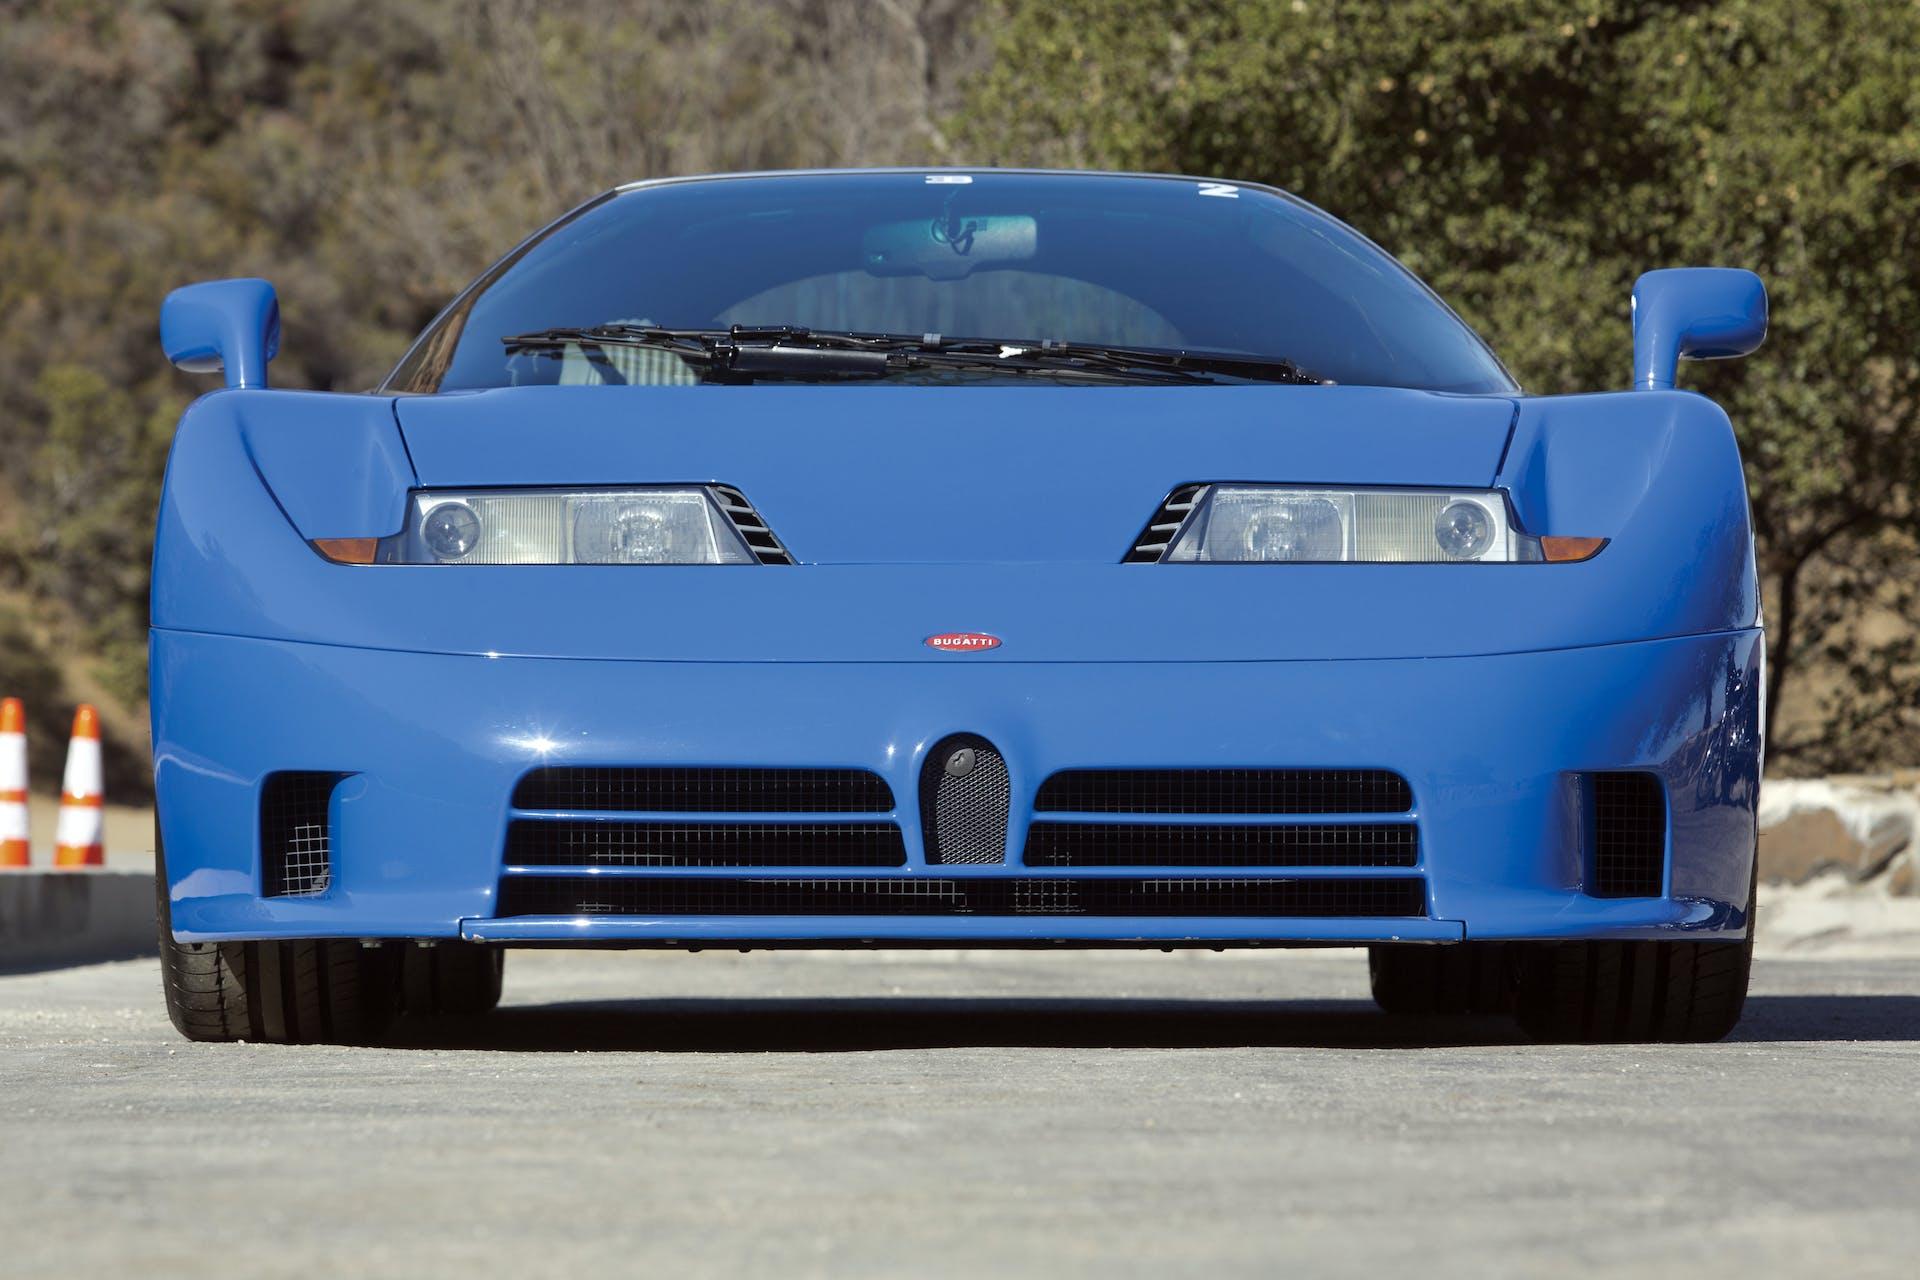 bugatti_eb110_gt blu frontale